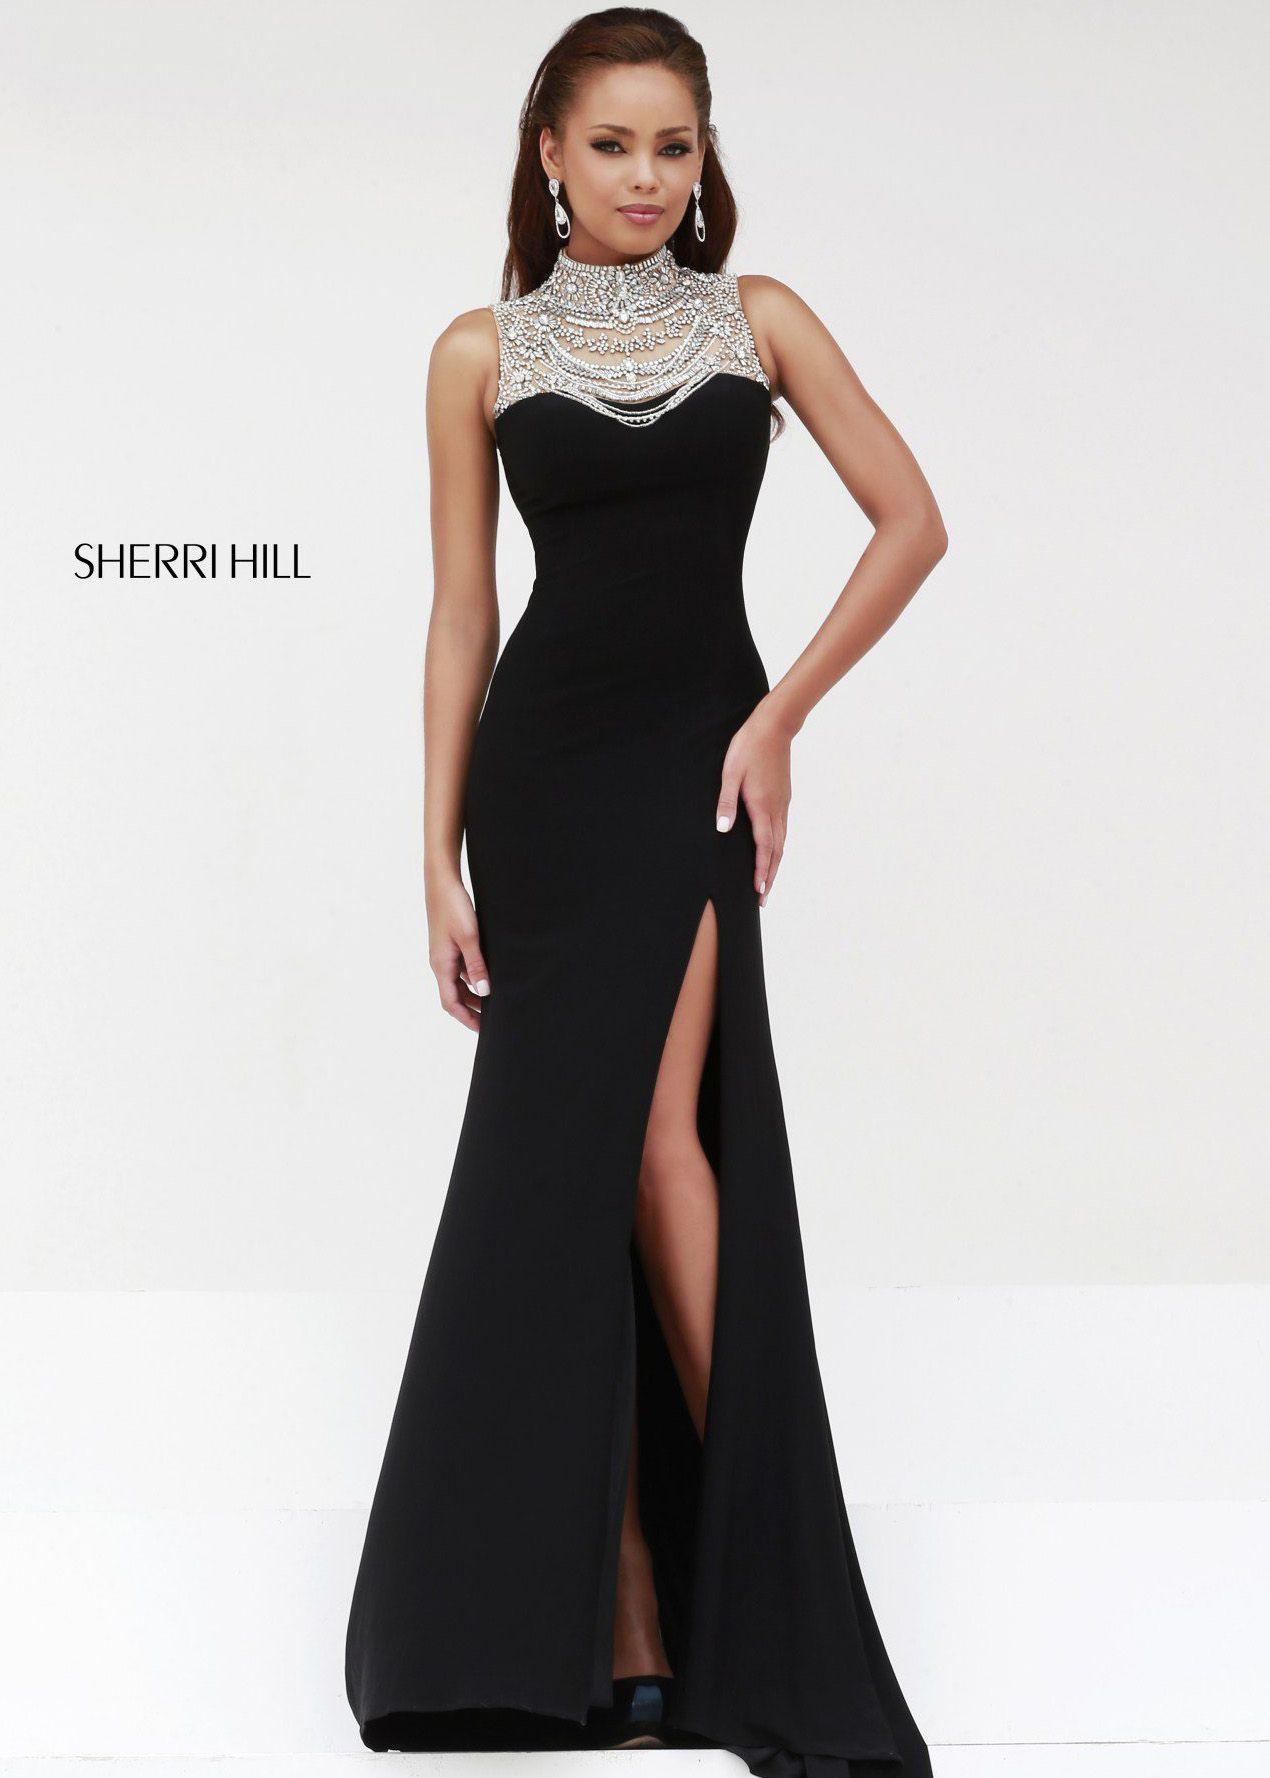 770c8912c005e Sherri Hill 21355 - Black/Silver Beaded Jersey Prom Dresses Online ...